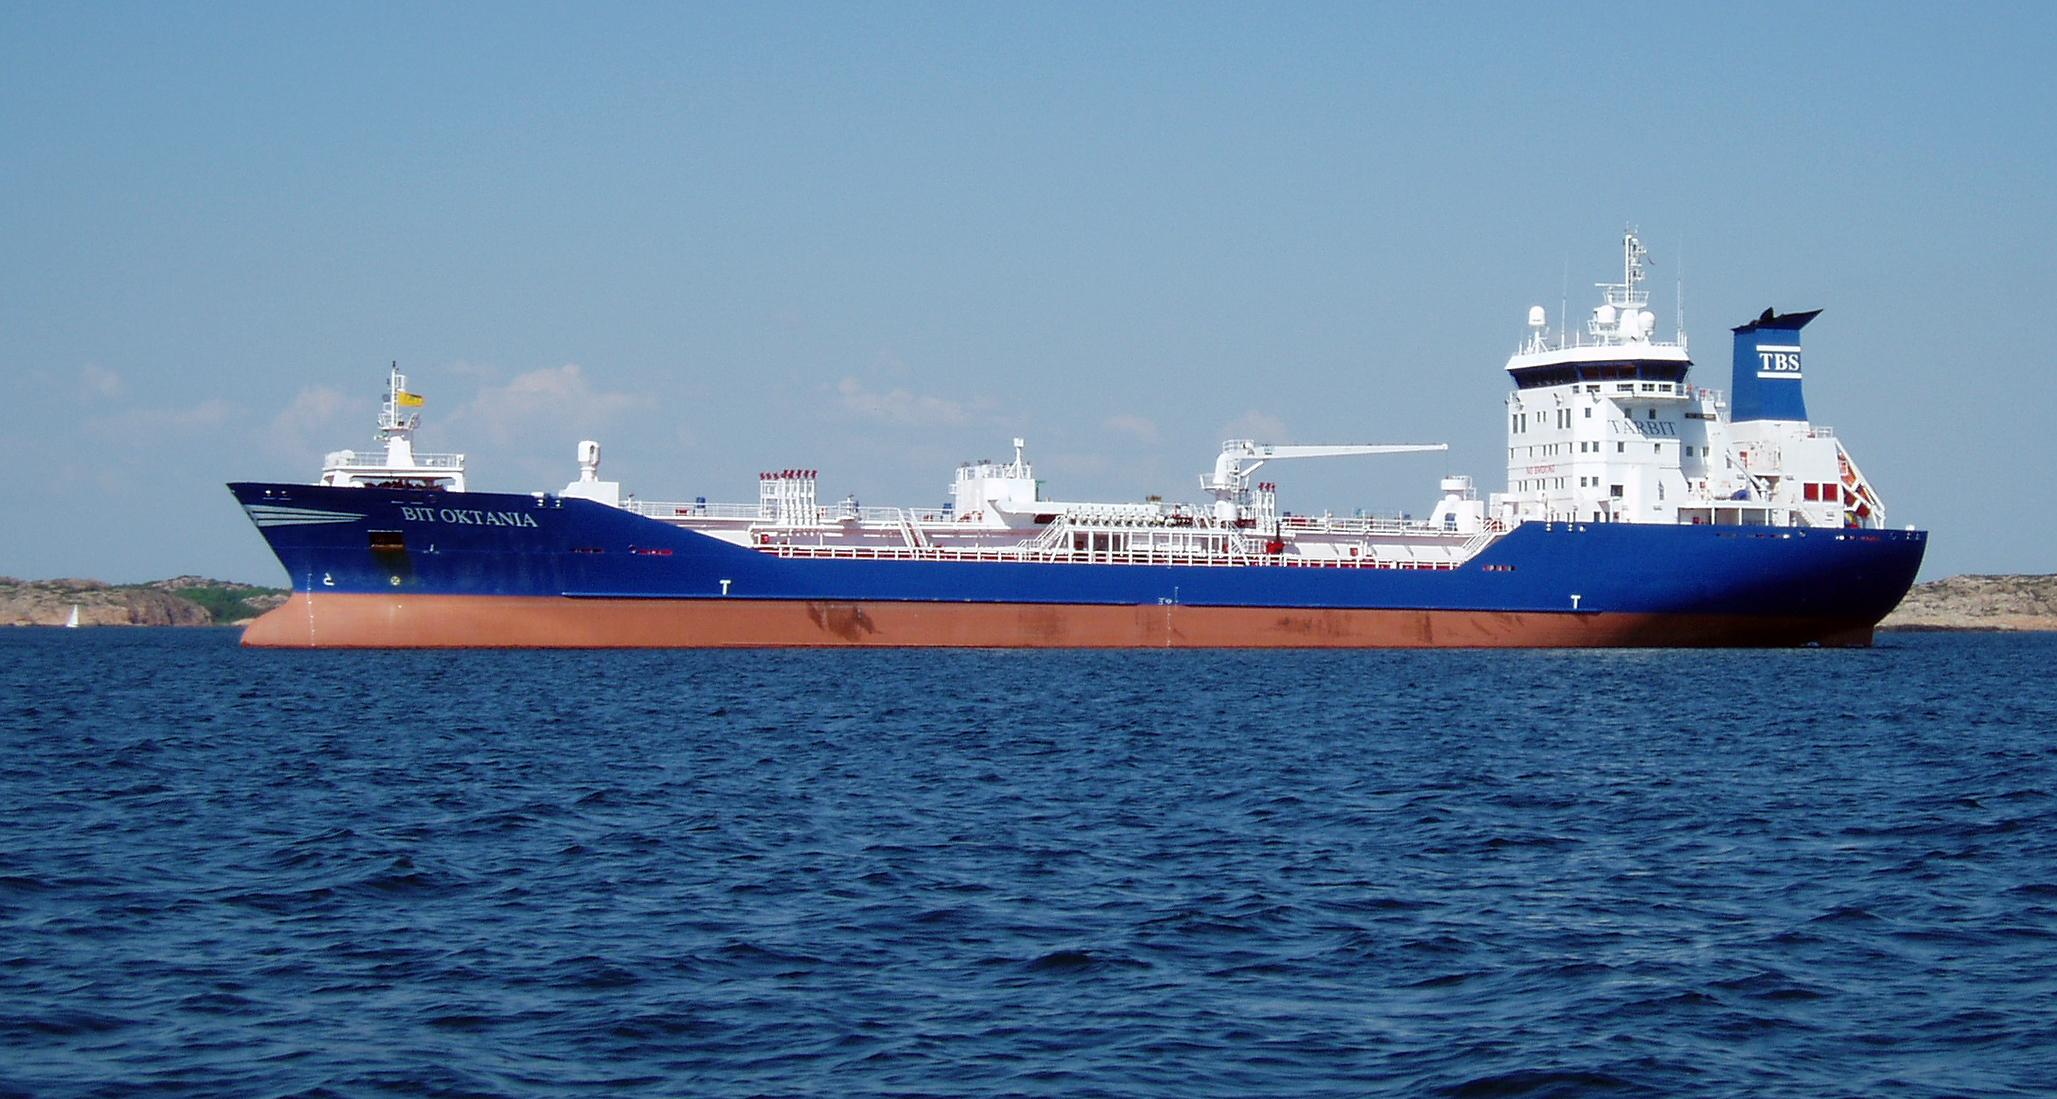 Svenskt fartyg slappte ut olja